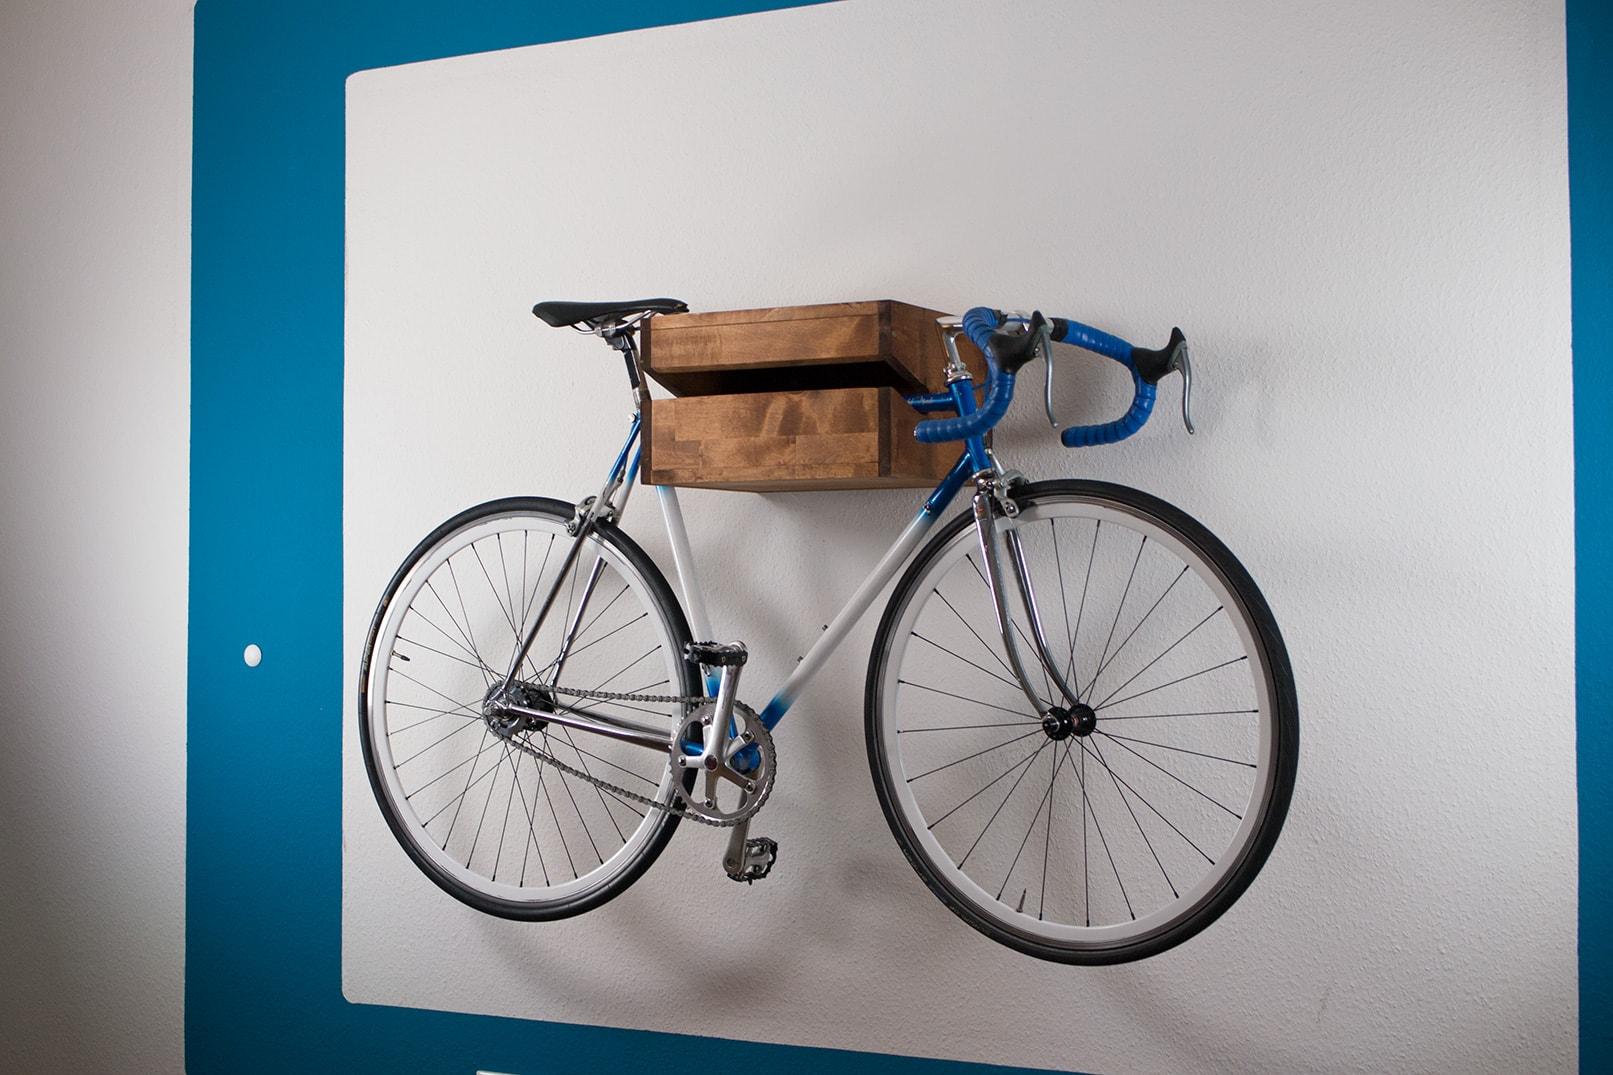 bikeshelf bauen min. Black Bedroom Furniture Sets. Home Design Ideas